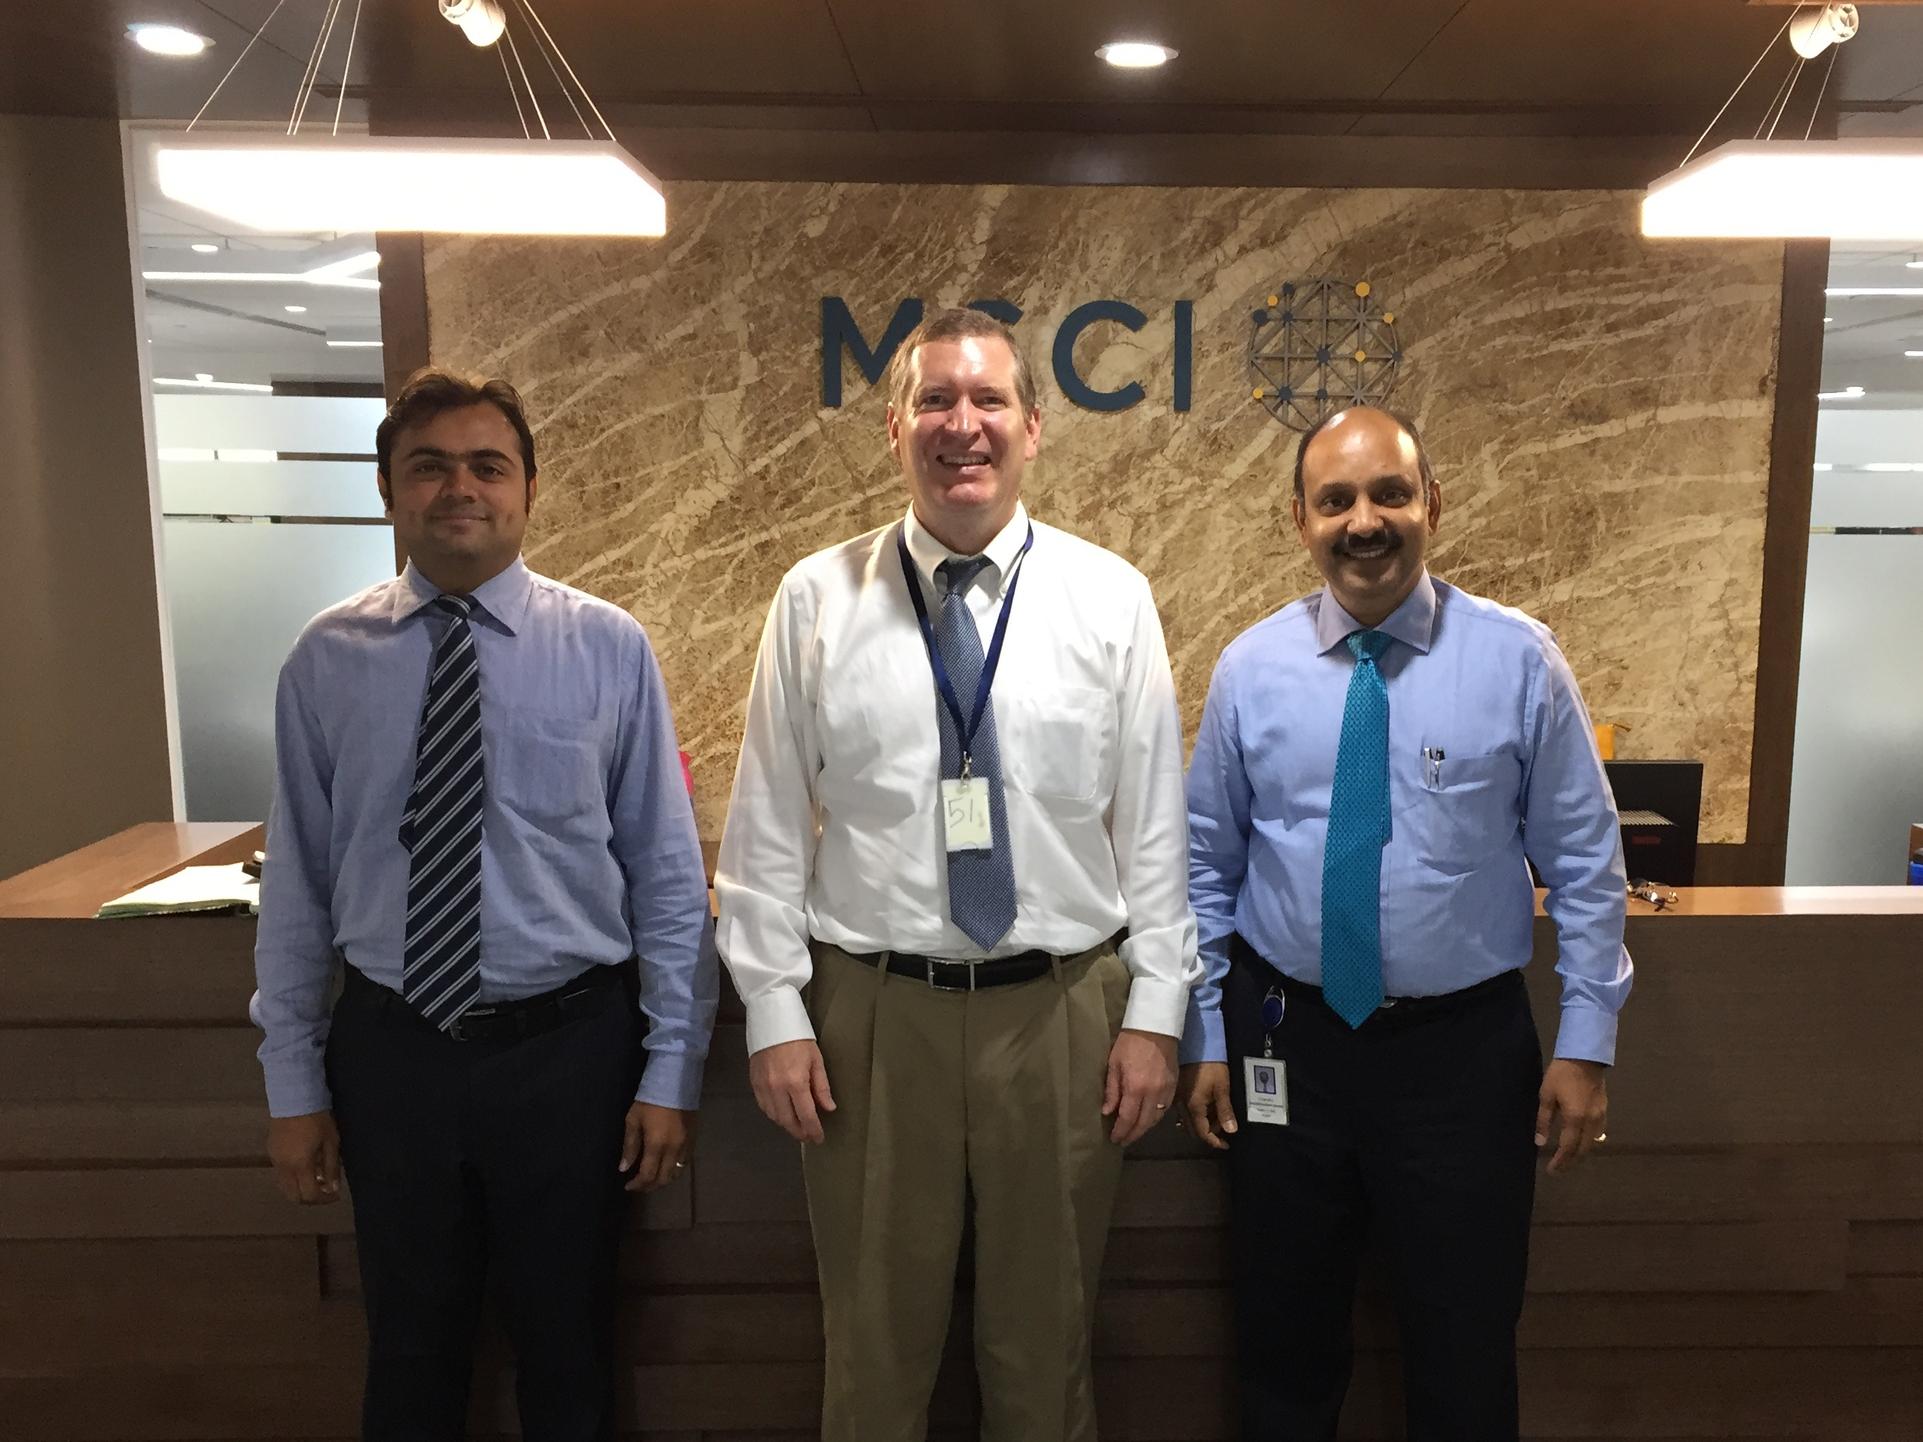 John Lunt with Chandru Badrinarayanan and Sushil Kumar Kiradoo of MSCI